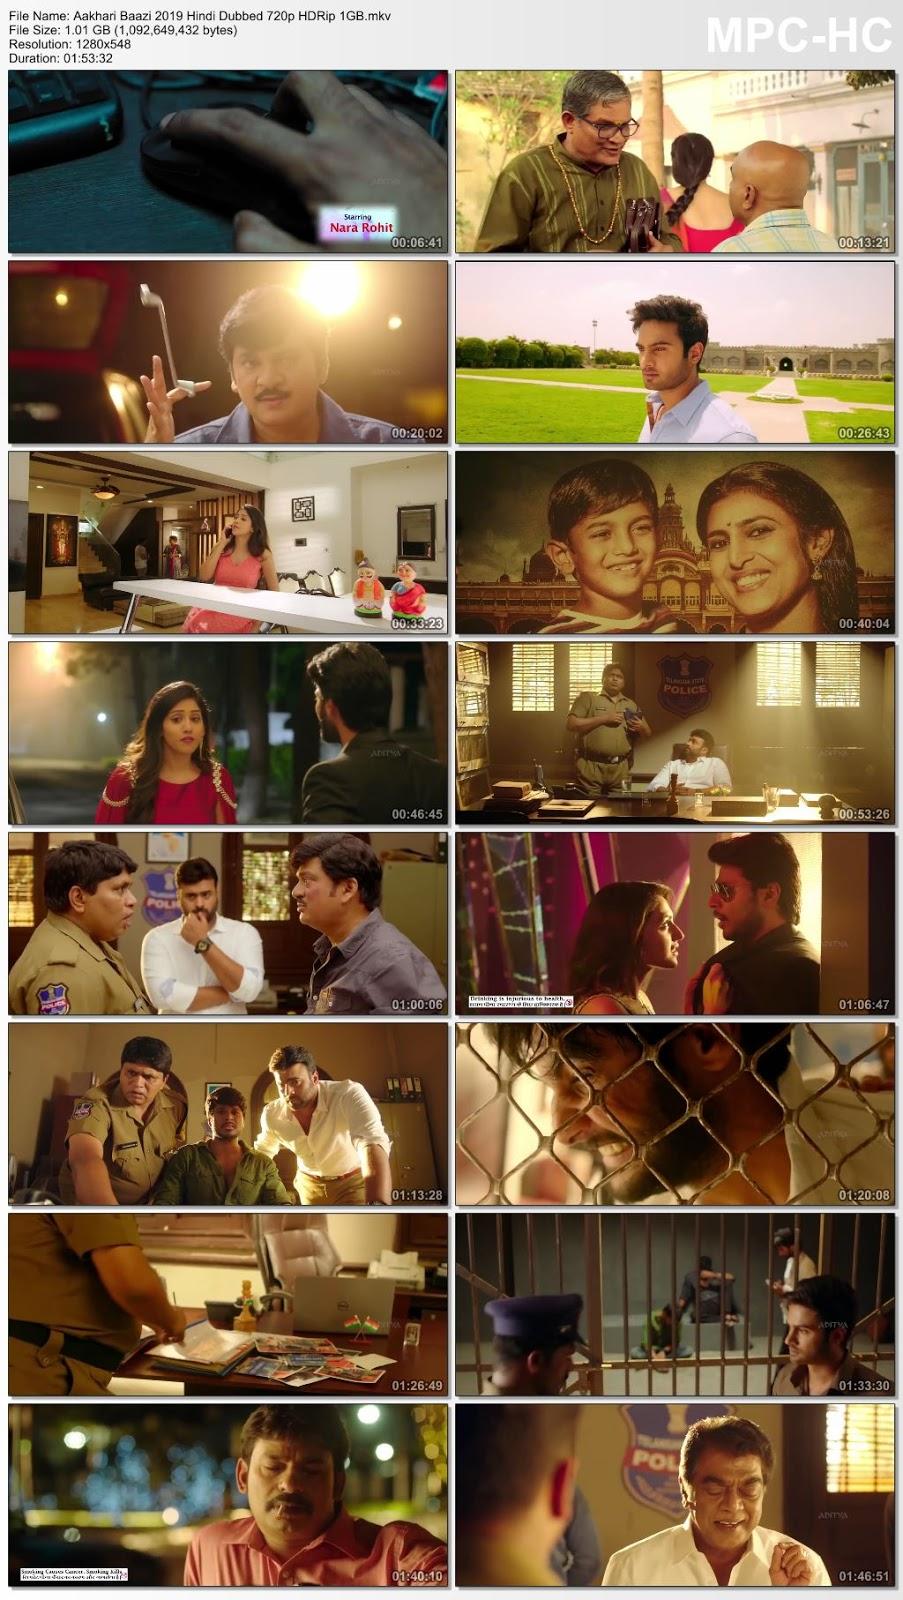 Aakhari Baazi (2019) Hindi Dubbed 720p HDRip 1GB Desirehub